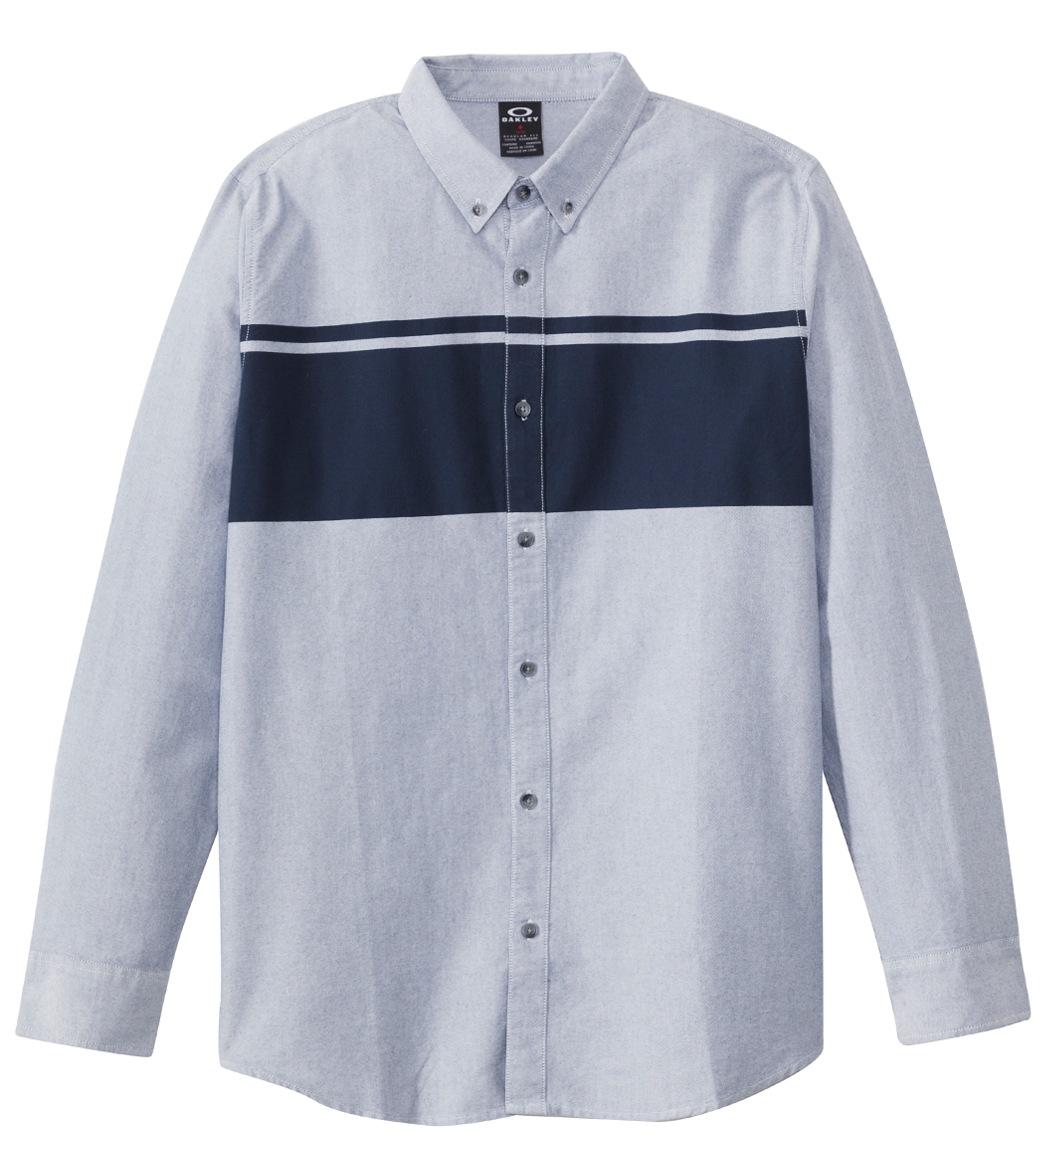 5b04ebf49f9d Oakley Men's Sims Woven L/S Shirt at SwimOutlet.com - Free Shipping